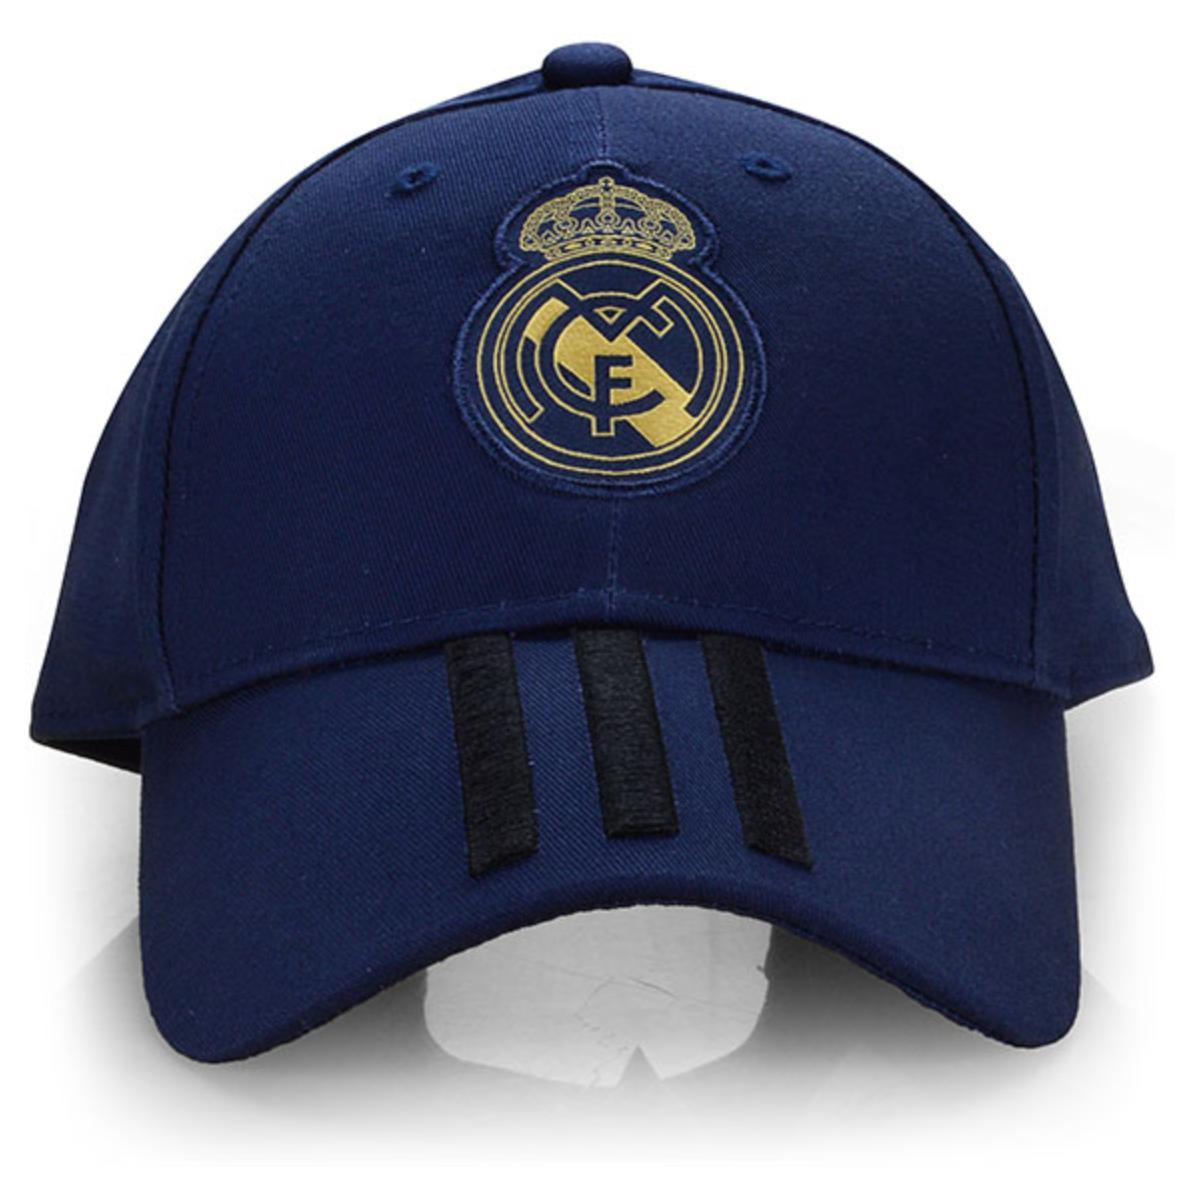 Boné Masculino Adidas Dy7721 Real Madrid C40 Marinho